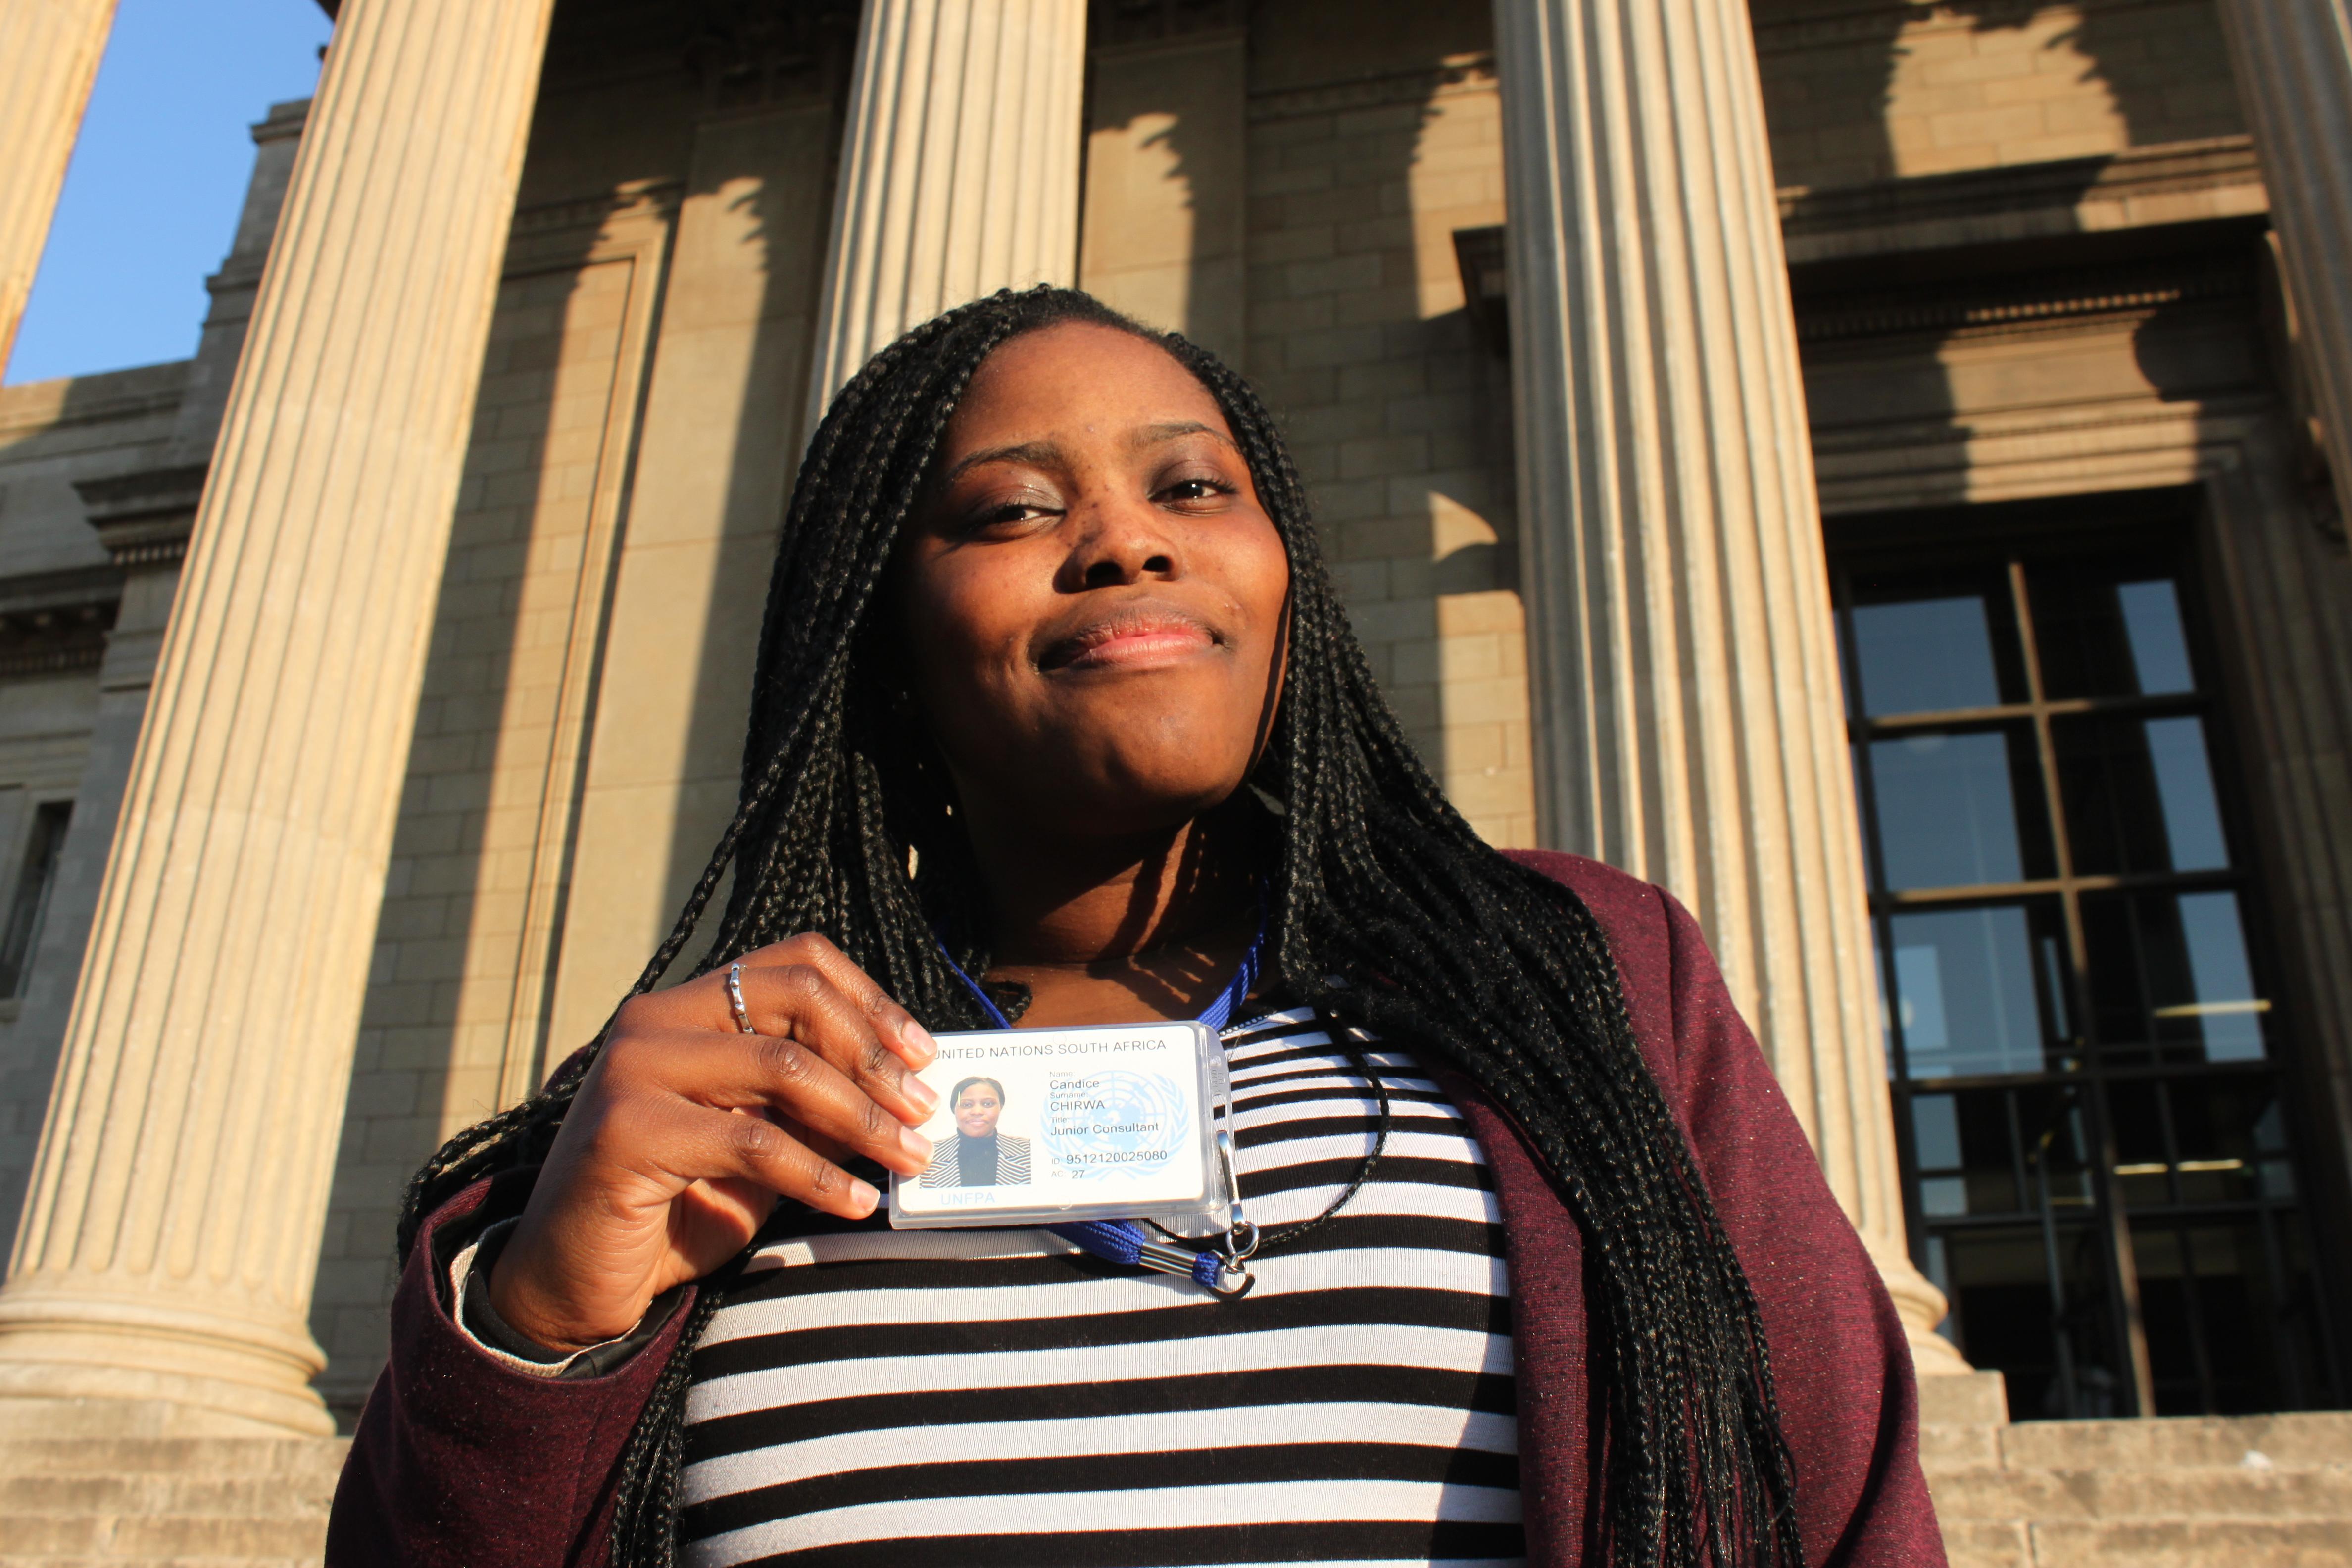 Cool kid on campus: Candice Chirwa